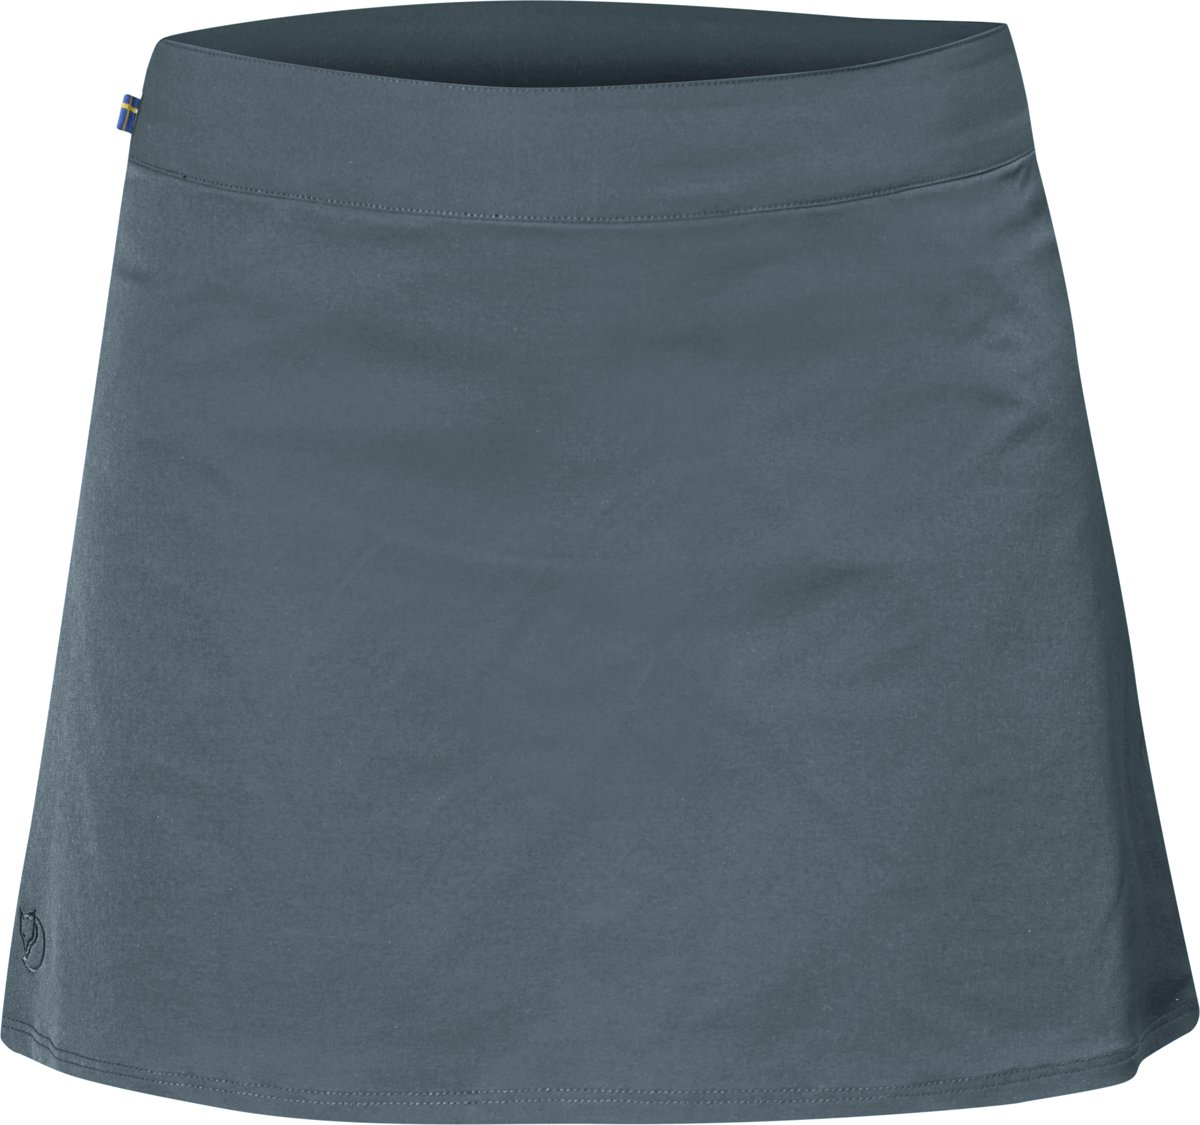 Fjällräven Abisko Trekking Skirt W Rok Dames - Dusk kopen